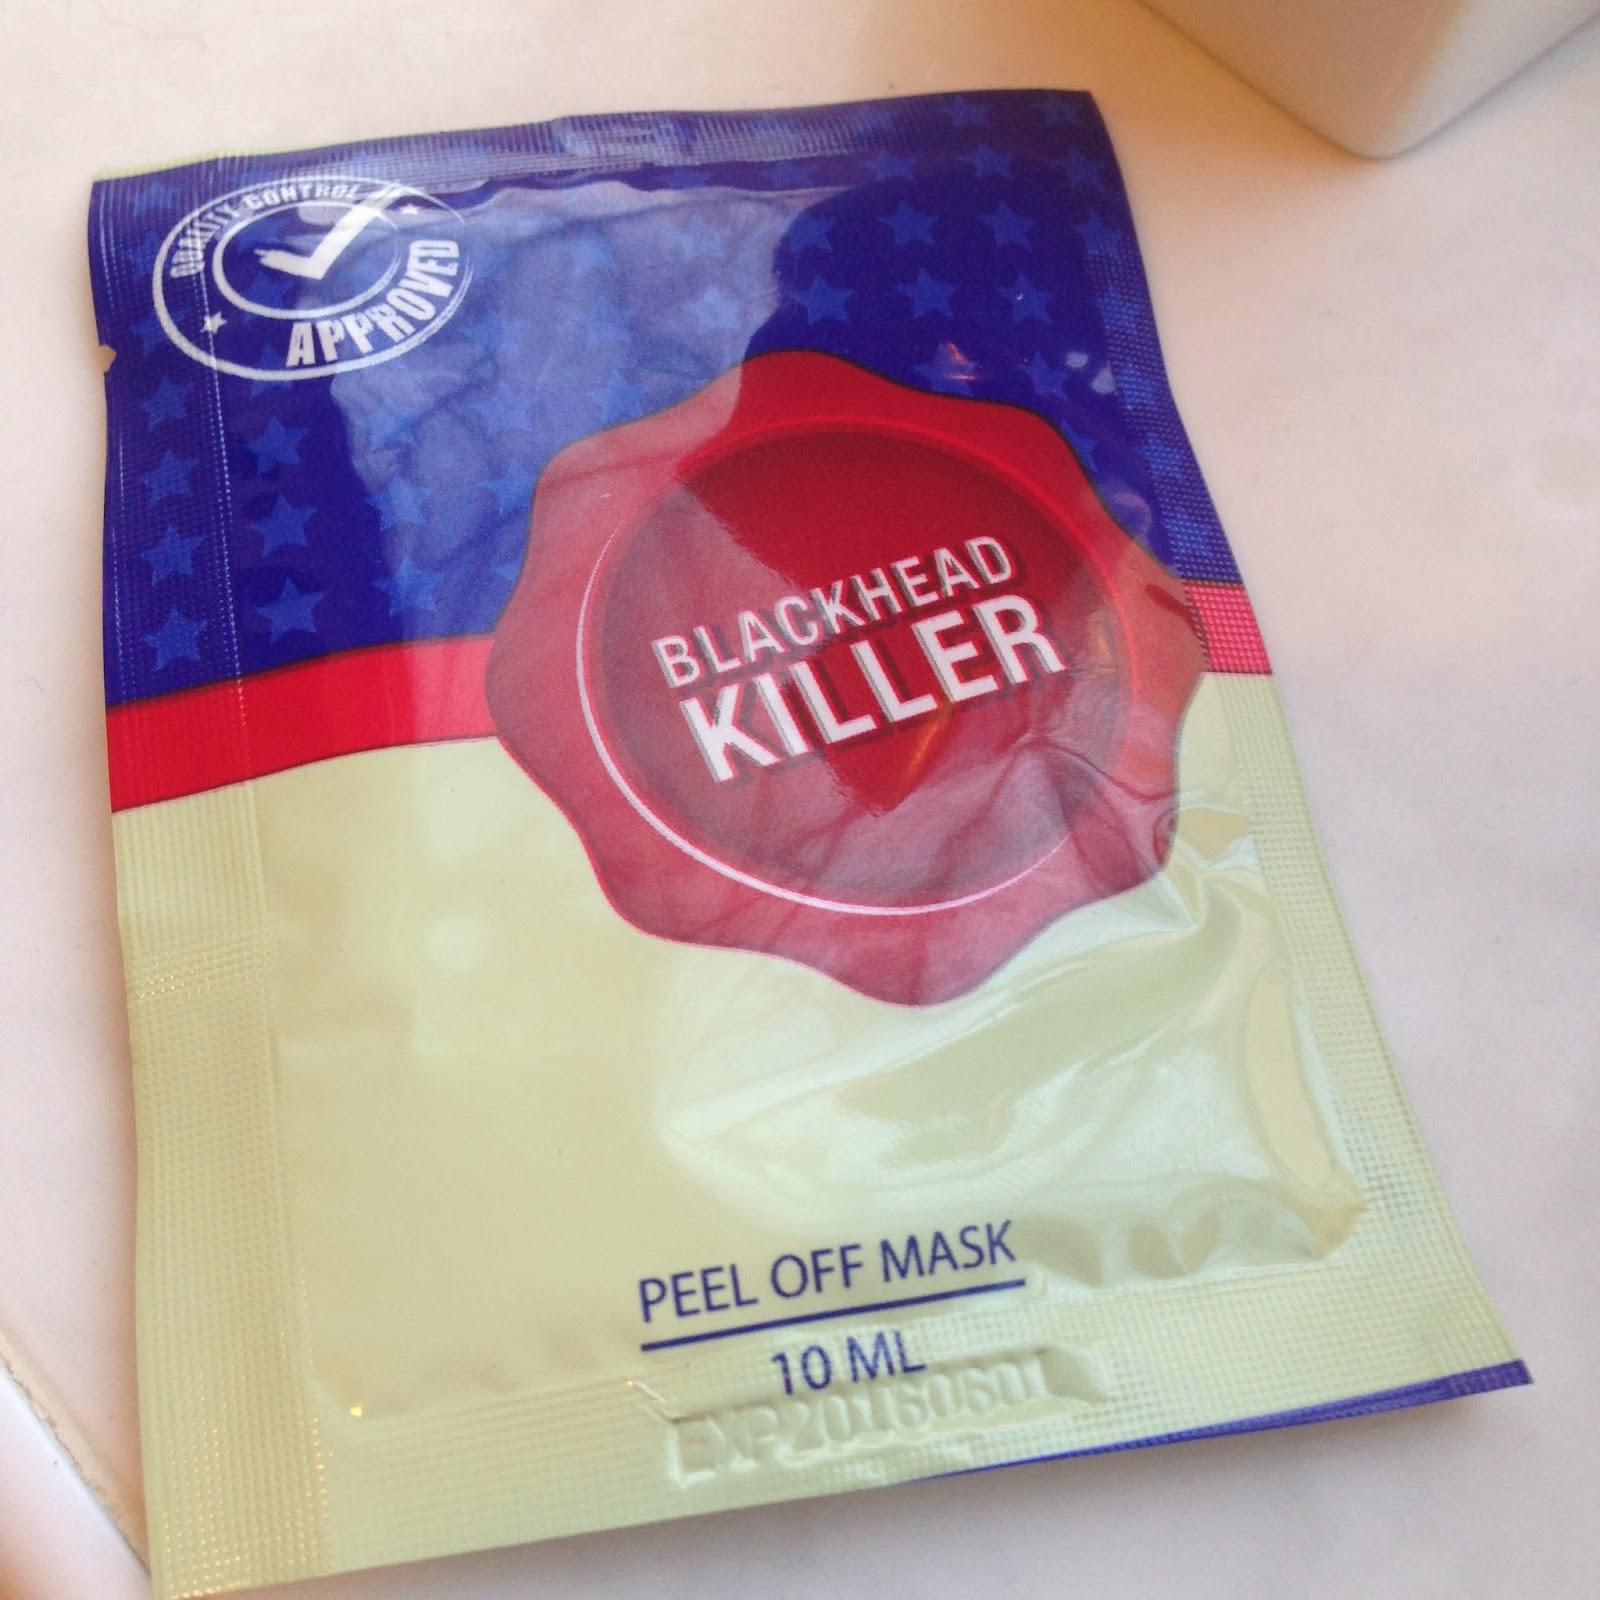 StyleLux Blackhead Killer Face Mask Review  |  LilliesandLove